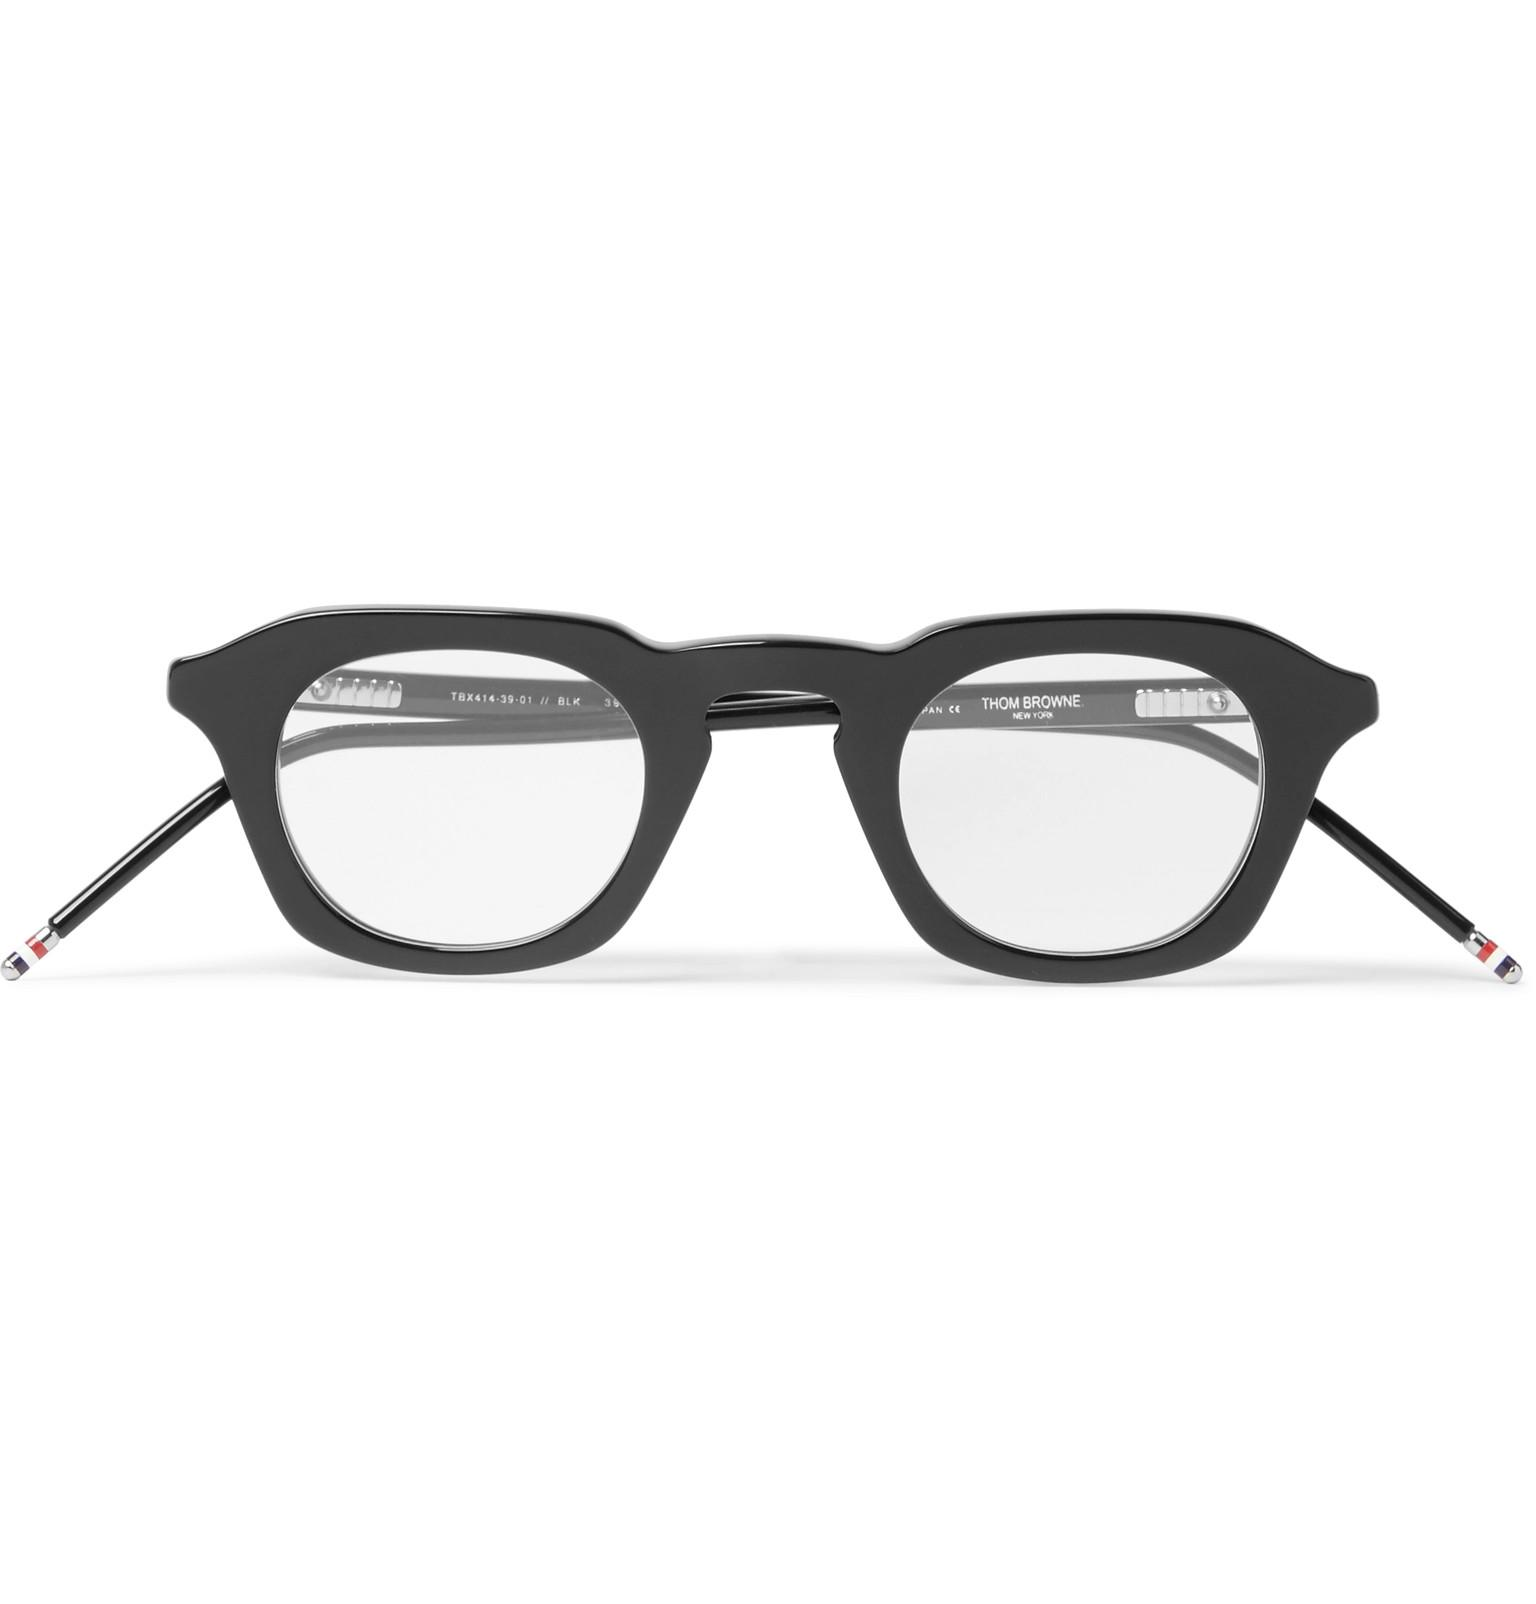 c8f644c26f Lyst - Thom Browne 414 D-frame Acetate Optical Glasses in Black for Men